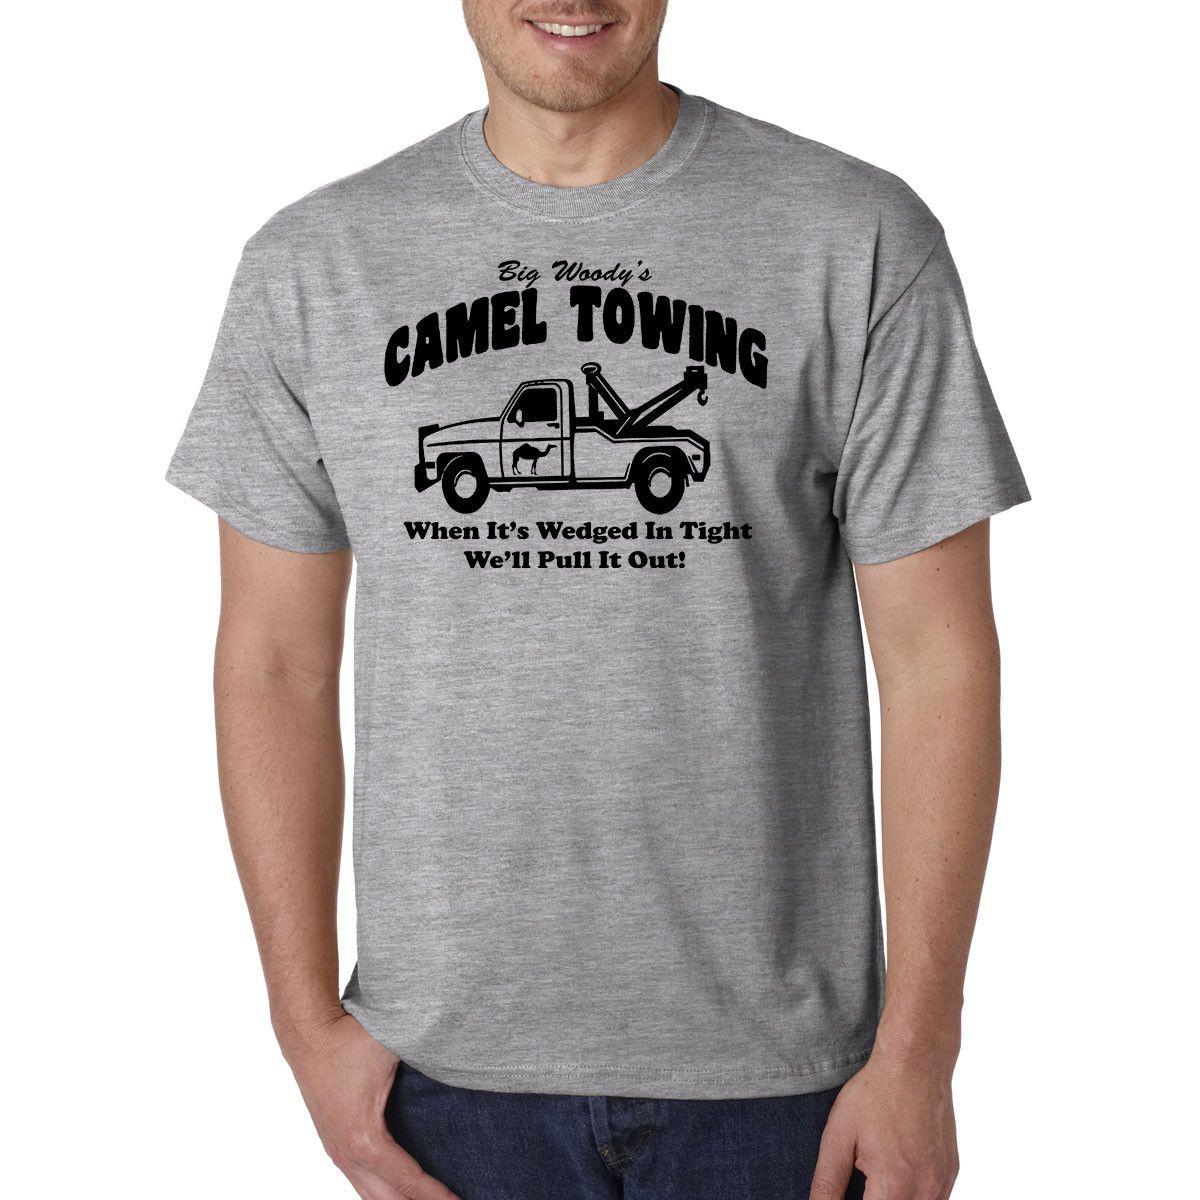 f4d9c1e61 Big Woody'S Camel Towing T Shirt Funny Trucker College Rude Humor Tee Toe  LOL Custom Printed Tshirt, Hip Hop Funny Tee, Mens Tee Shirts T Sirt T Shirt  Sites ...